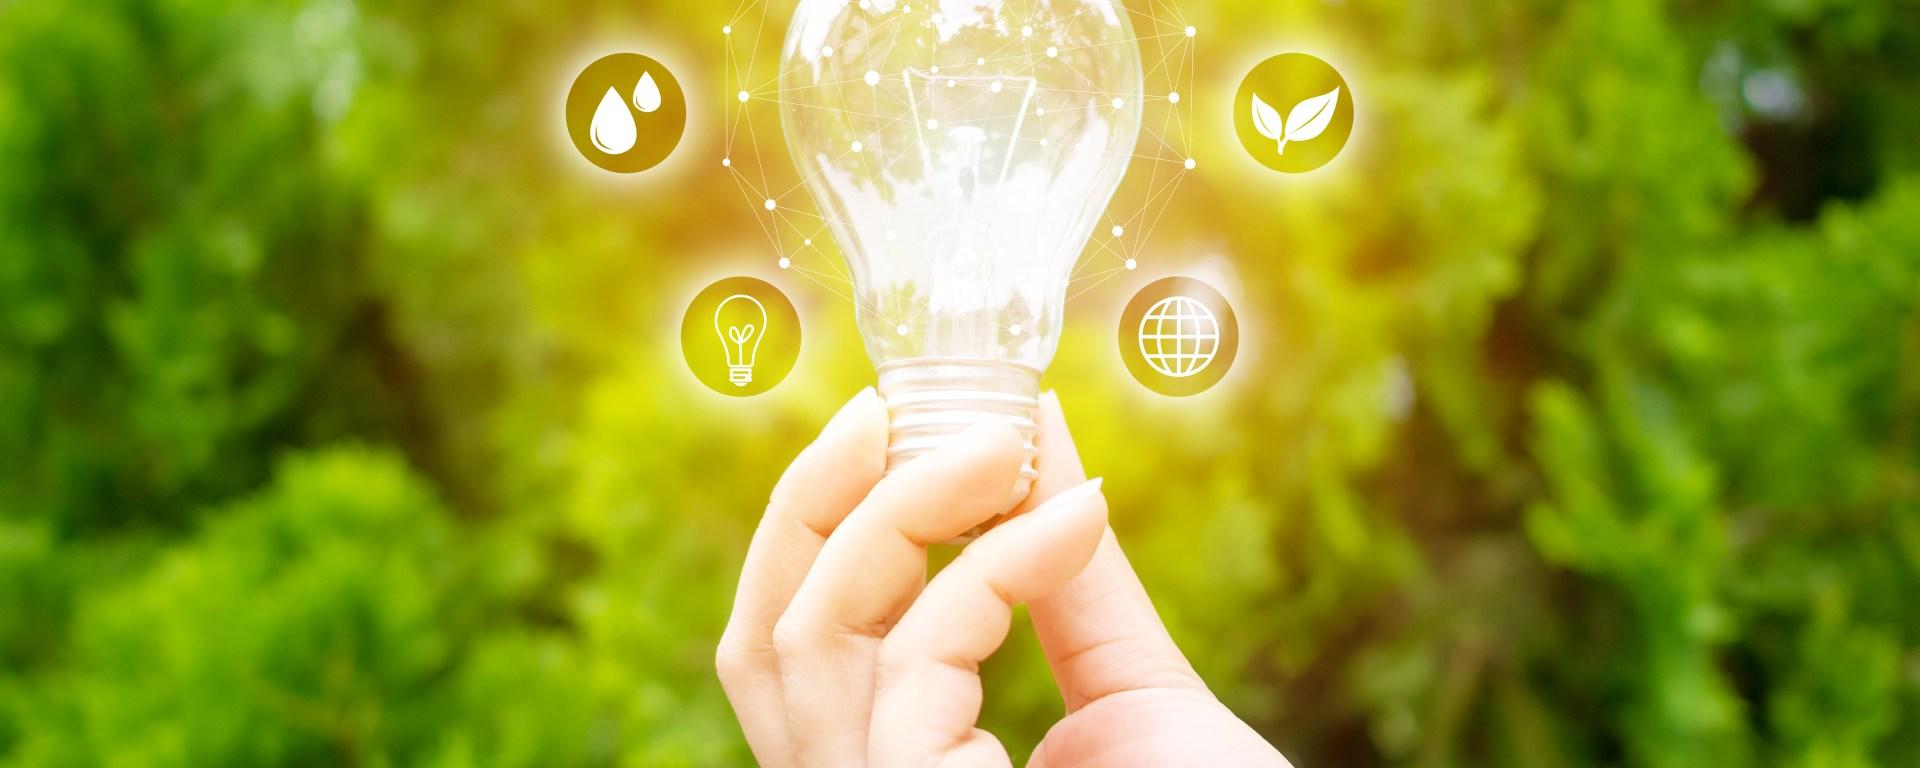 renewable-energies-investment-across-the-world